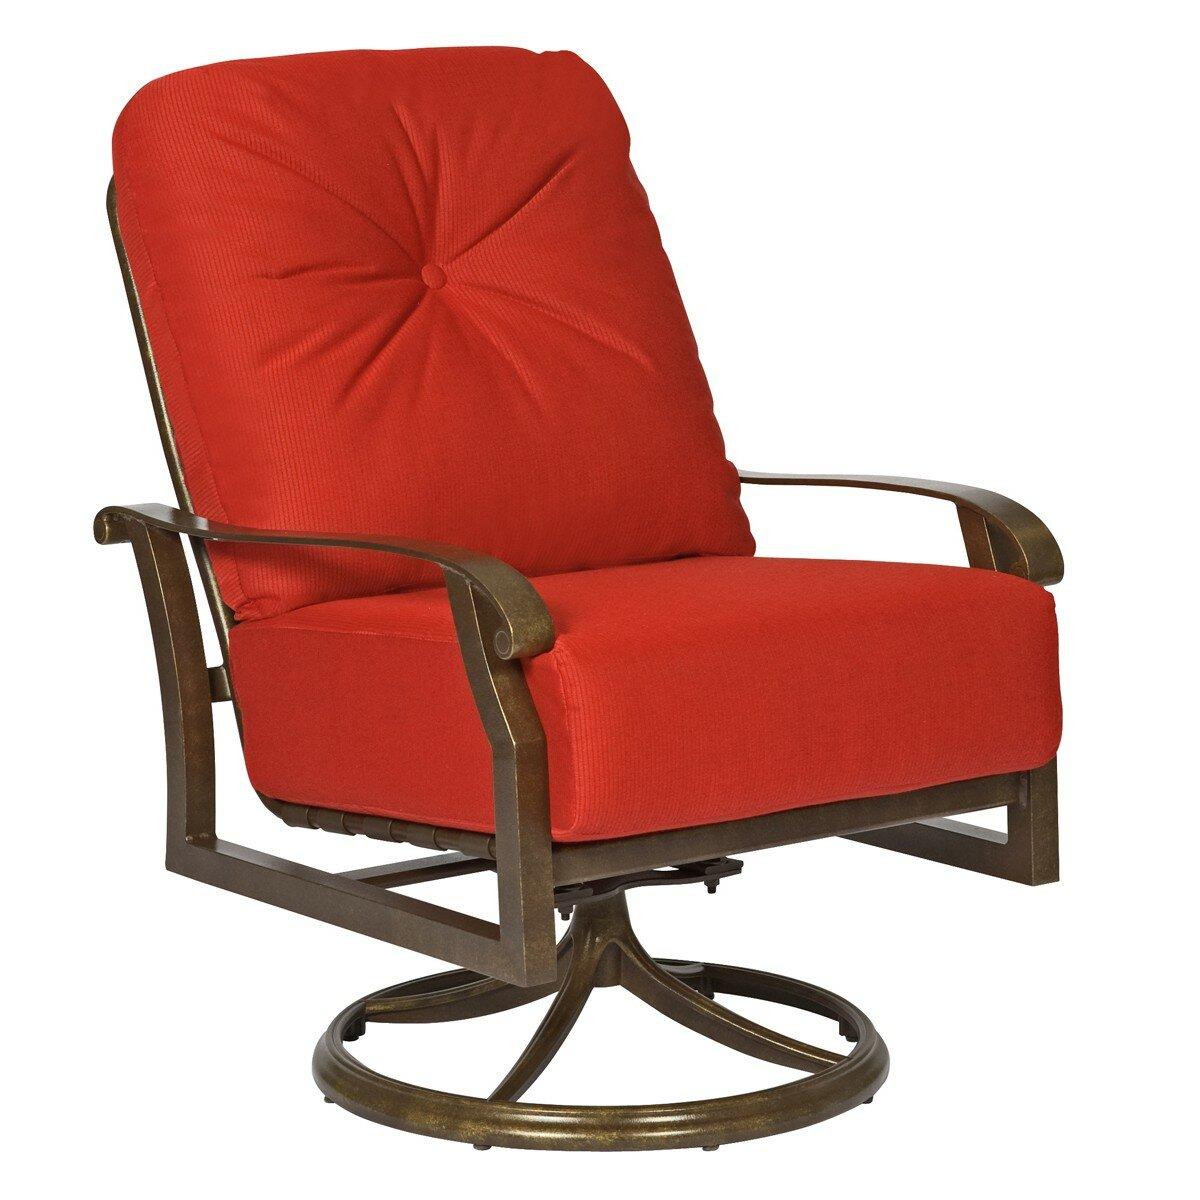 Woodard Cortland Swivel Rocking Patio Chair With Cushions | Wayfair